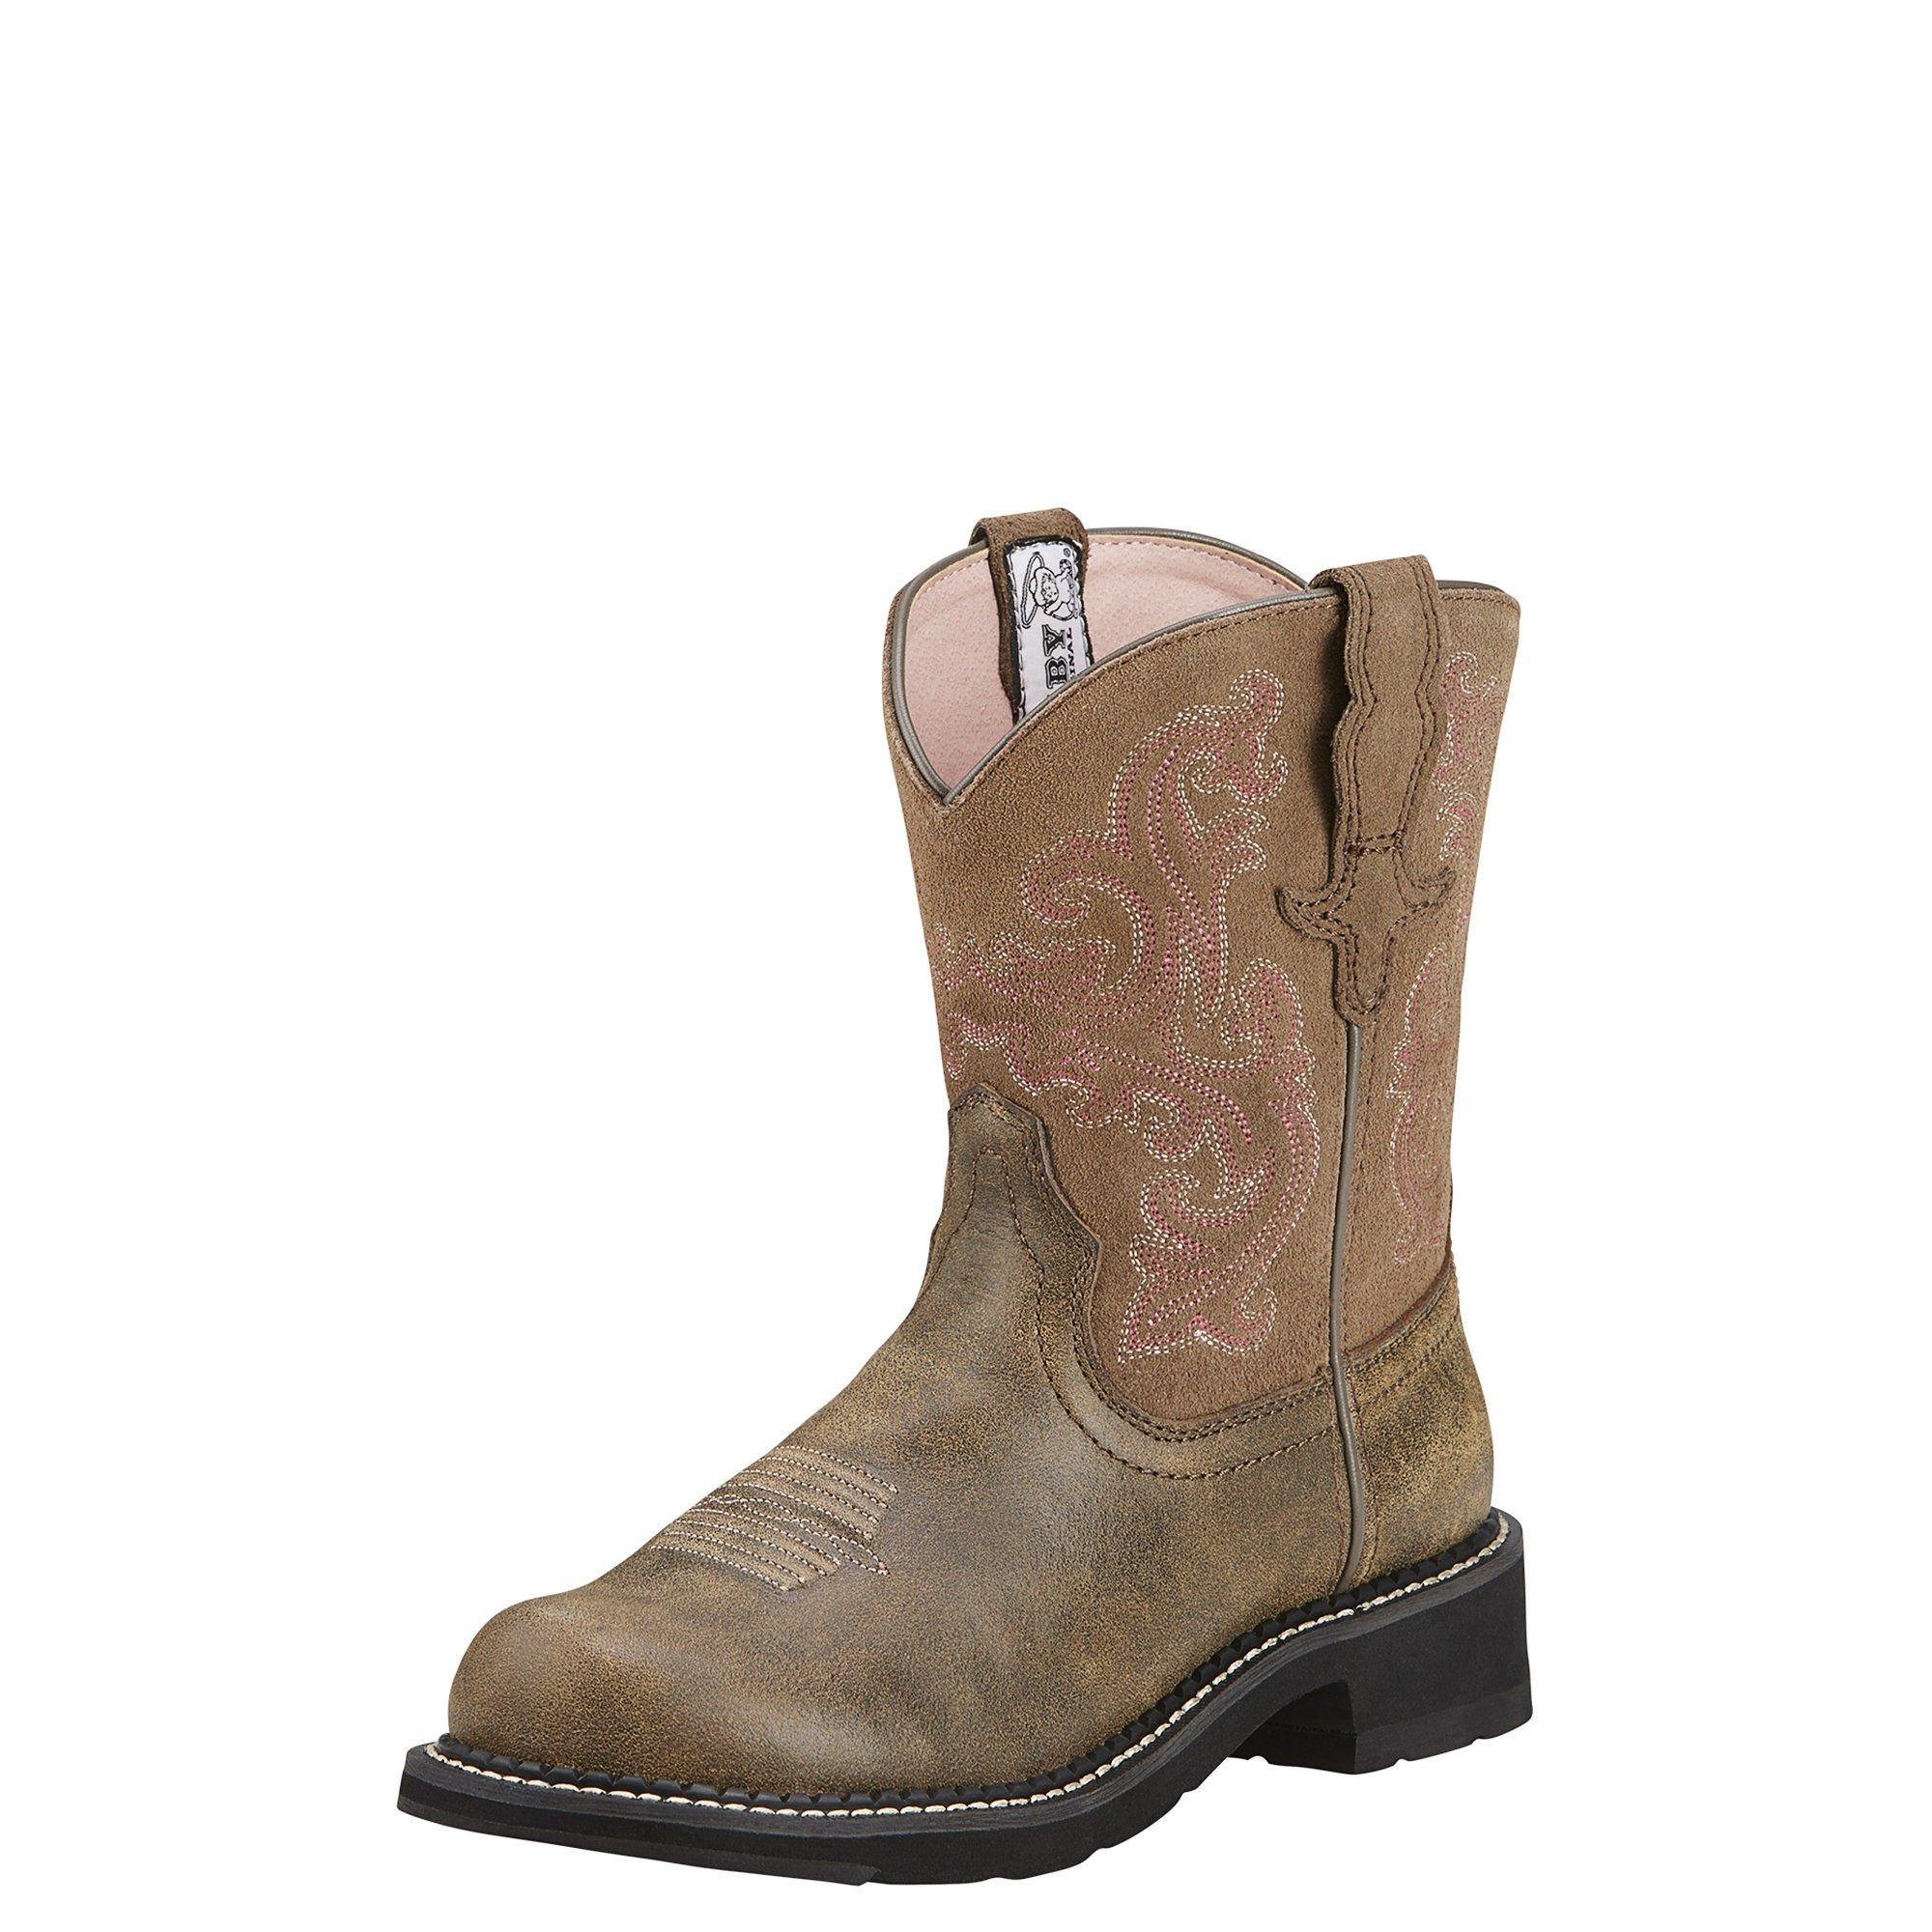 Ariat Women's Fatbaby II Western Cowboy Boot, Brown Bomber, 9.5 M US